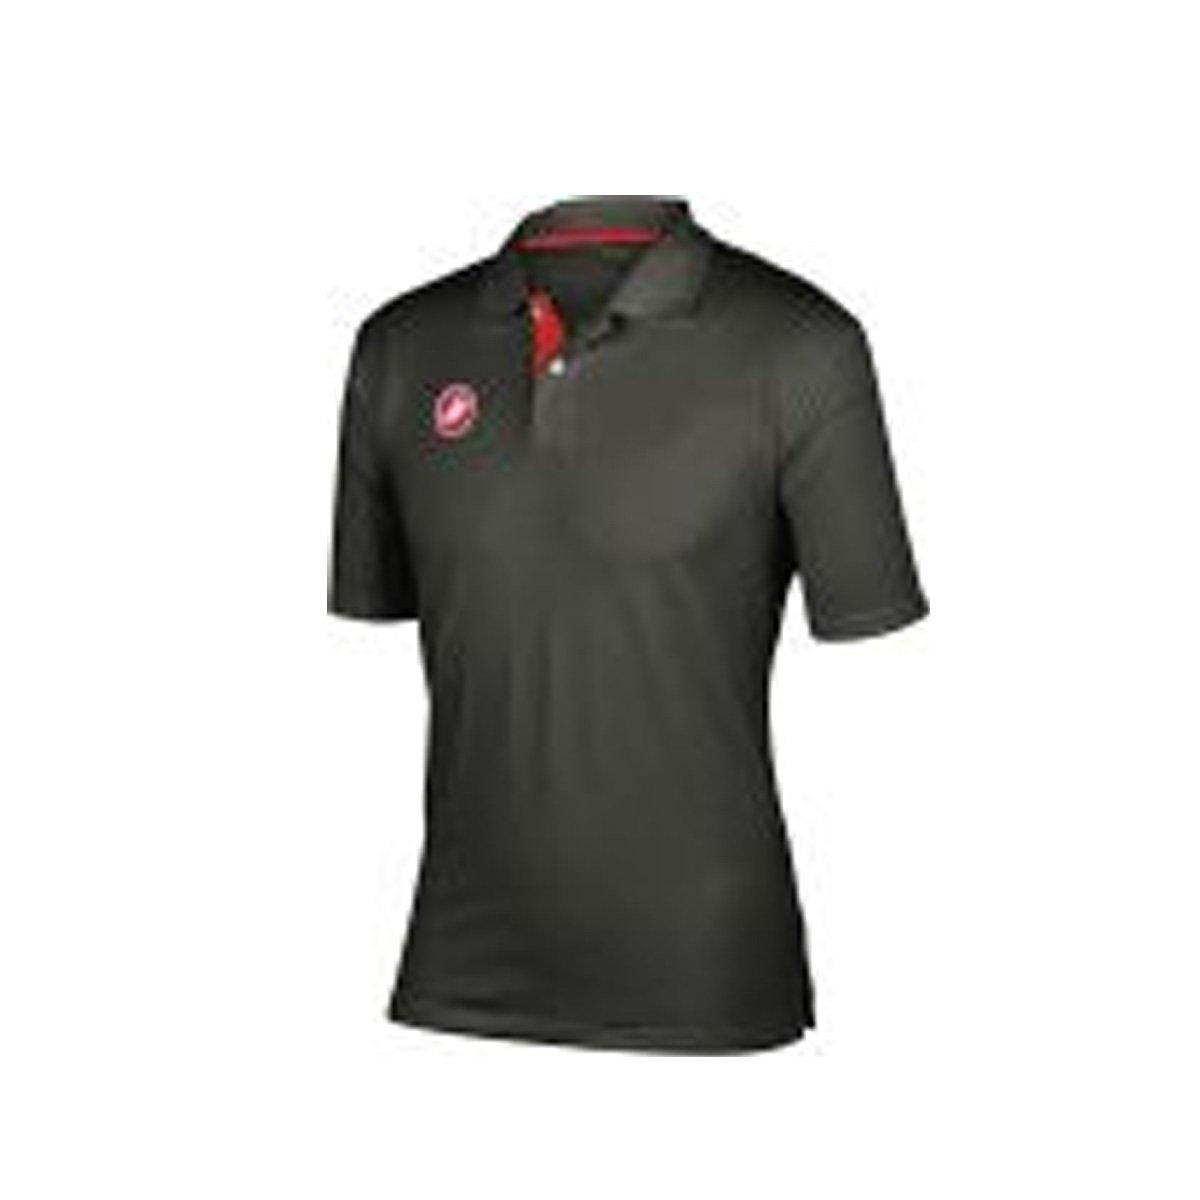 Amazon.com: Castelli Race Day Polo Shirt - Mens: Sports ...